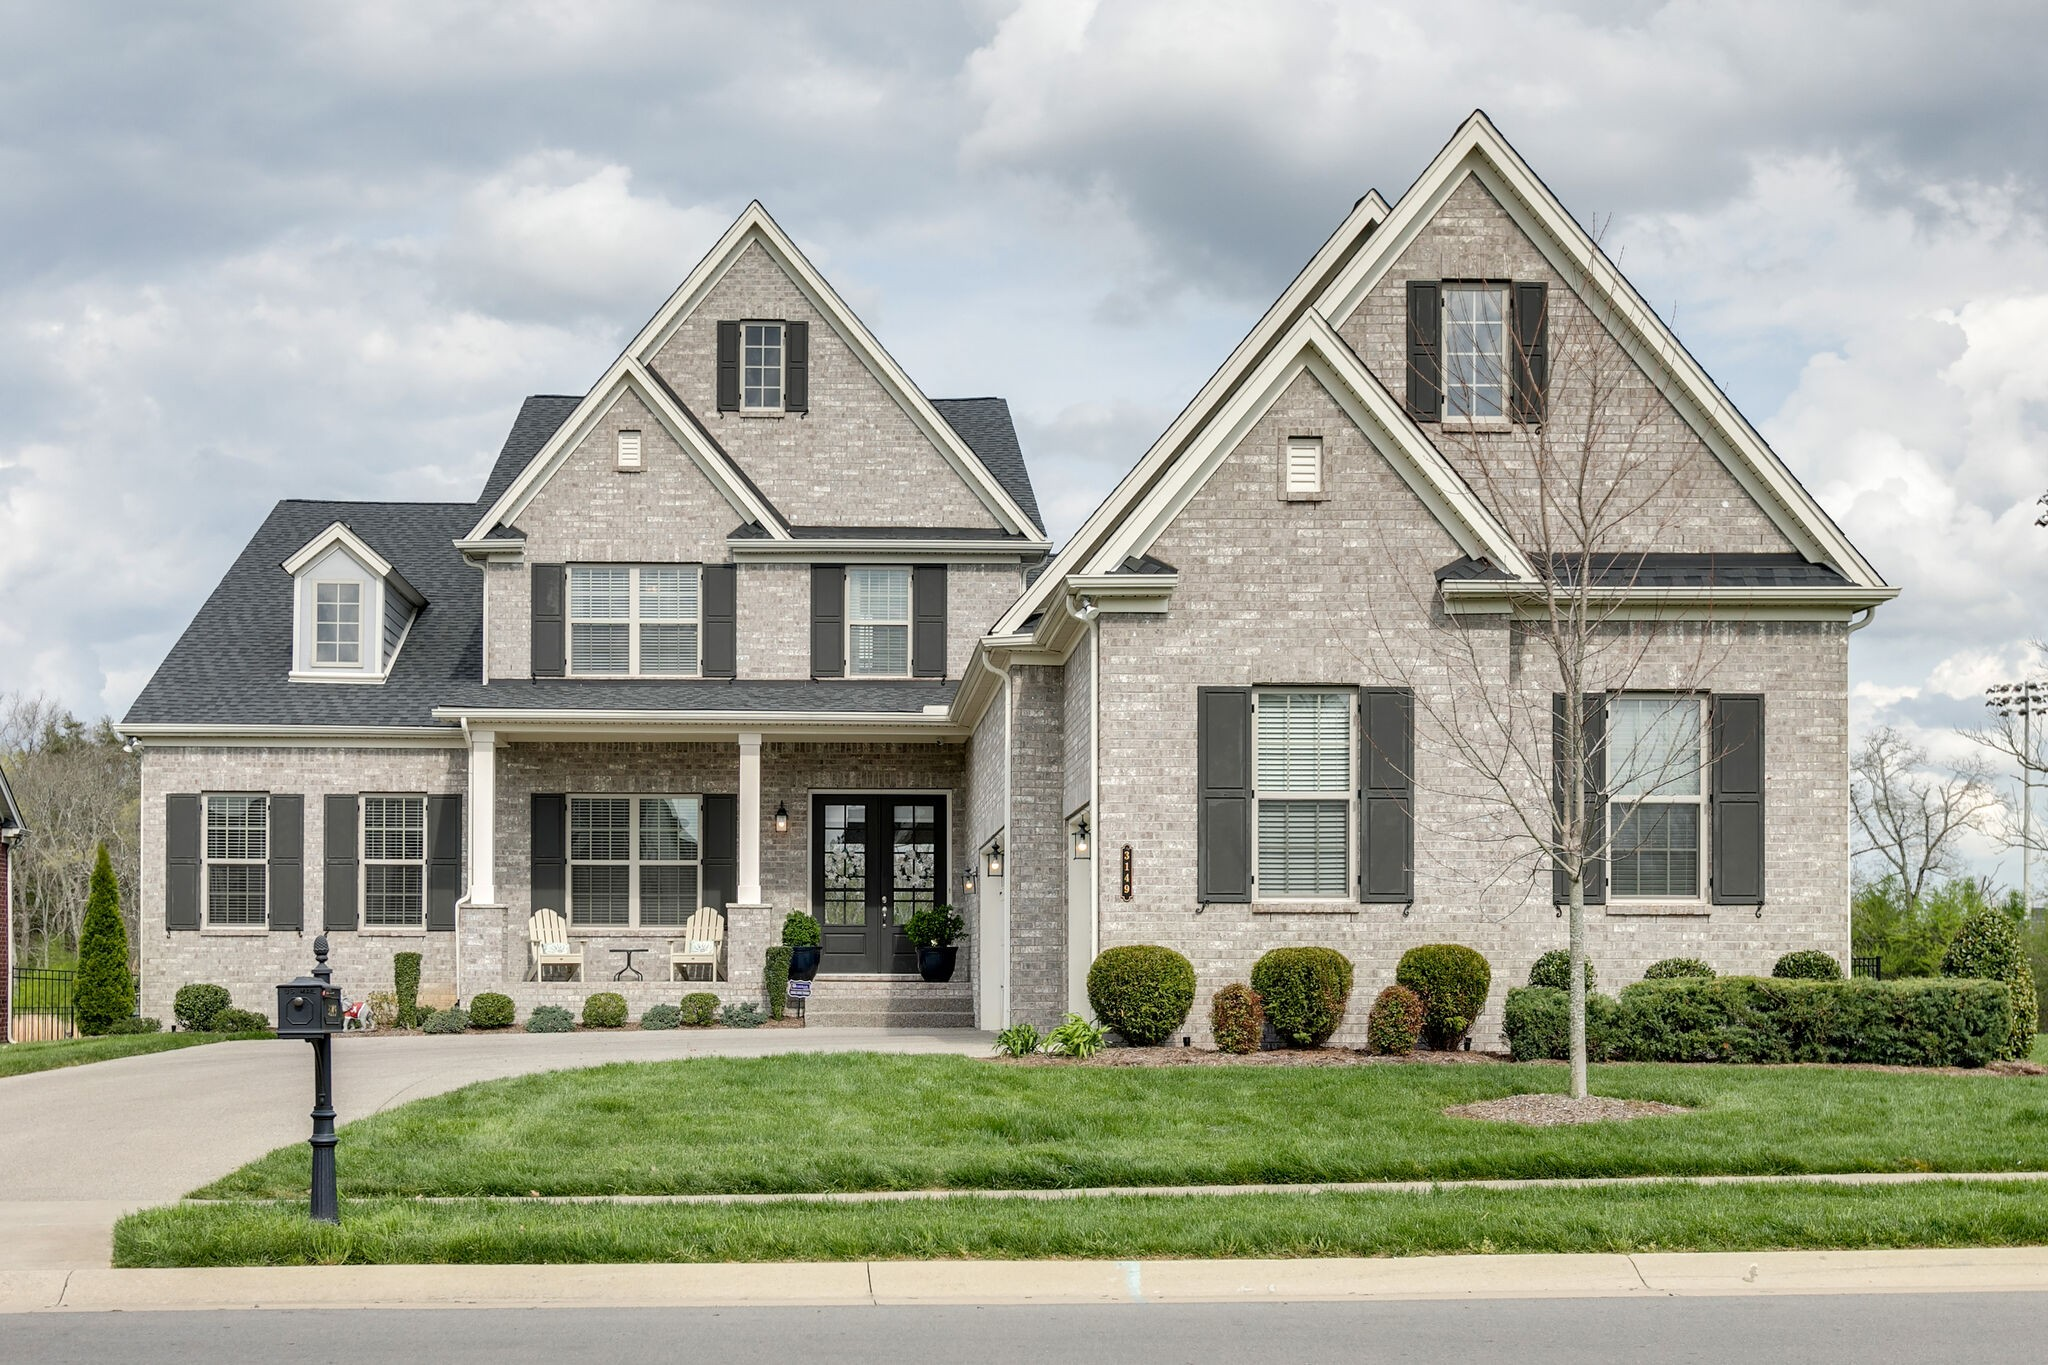 3149 Bradfield Dr Property Photo - Nolensville, TN real estate listing